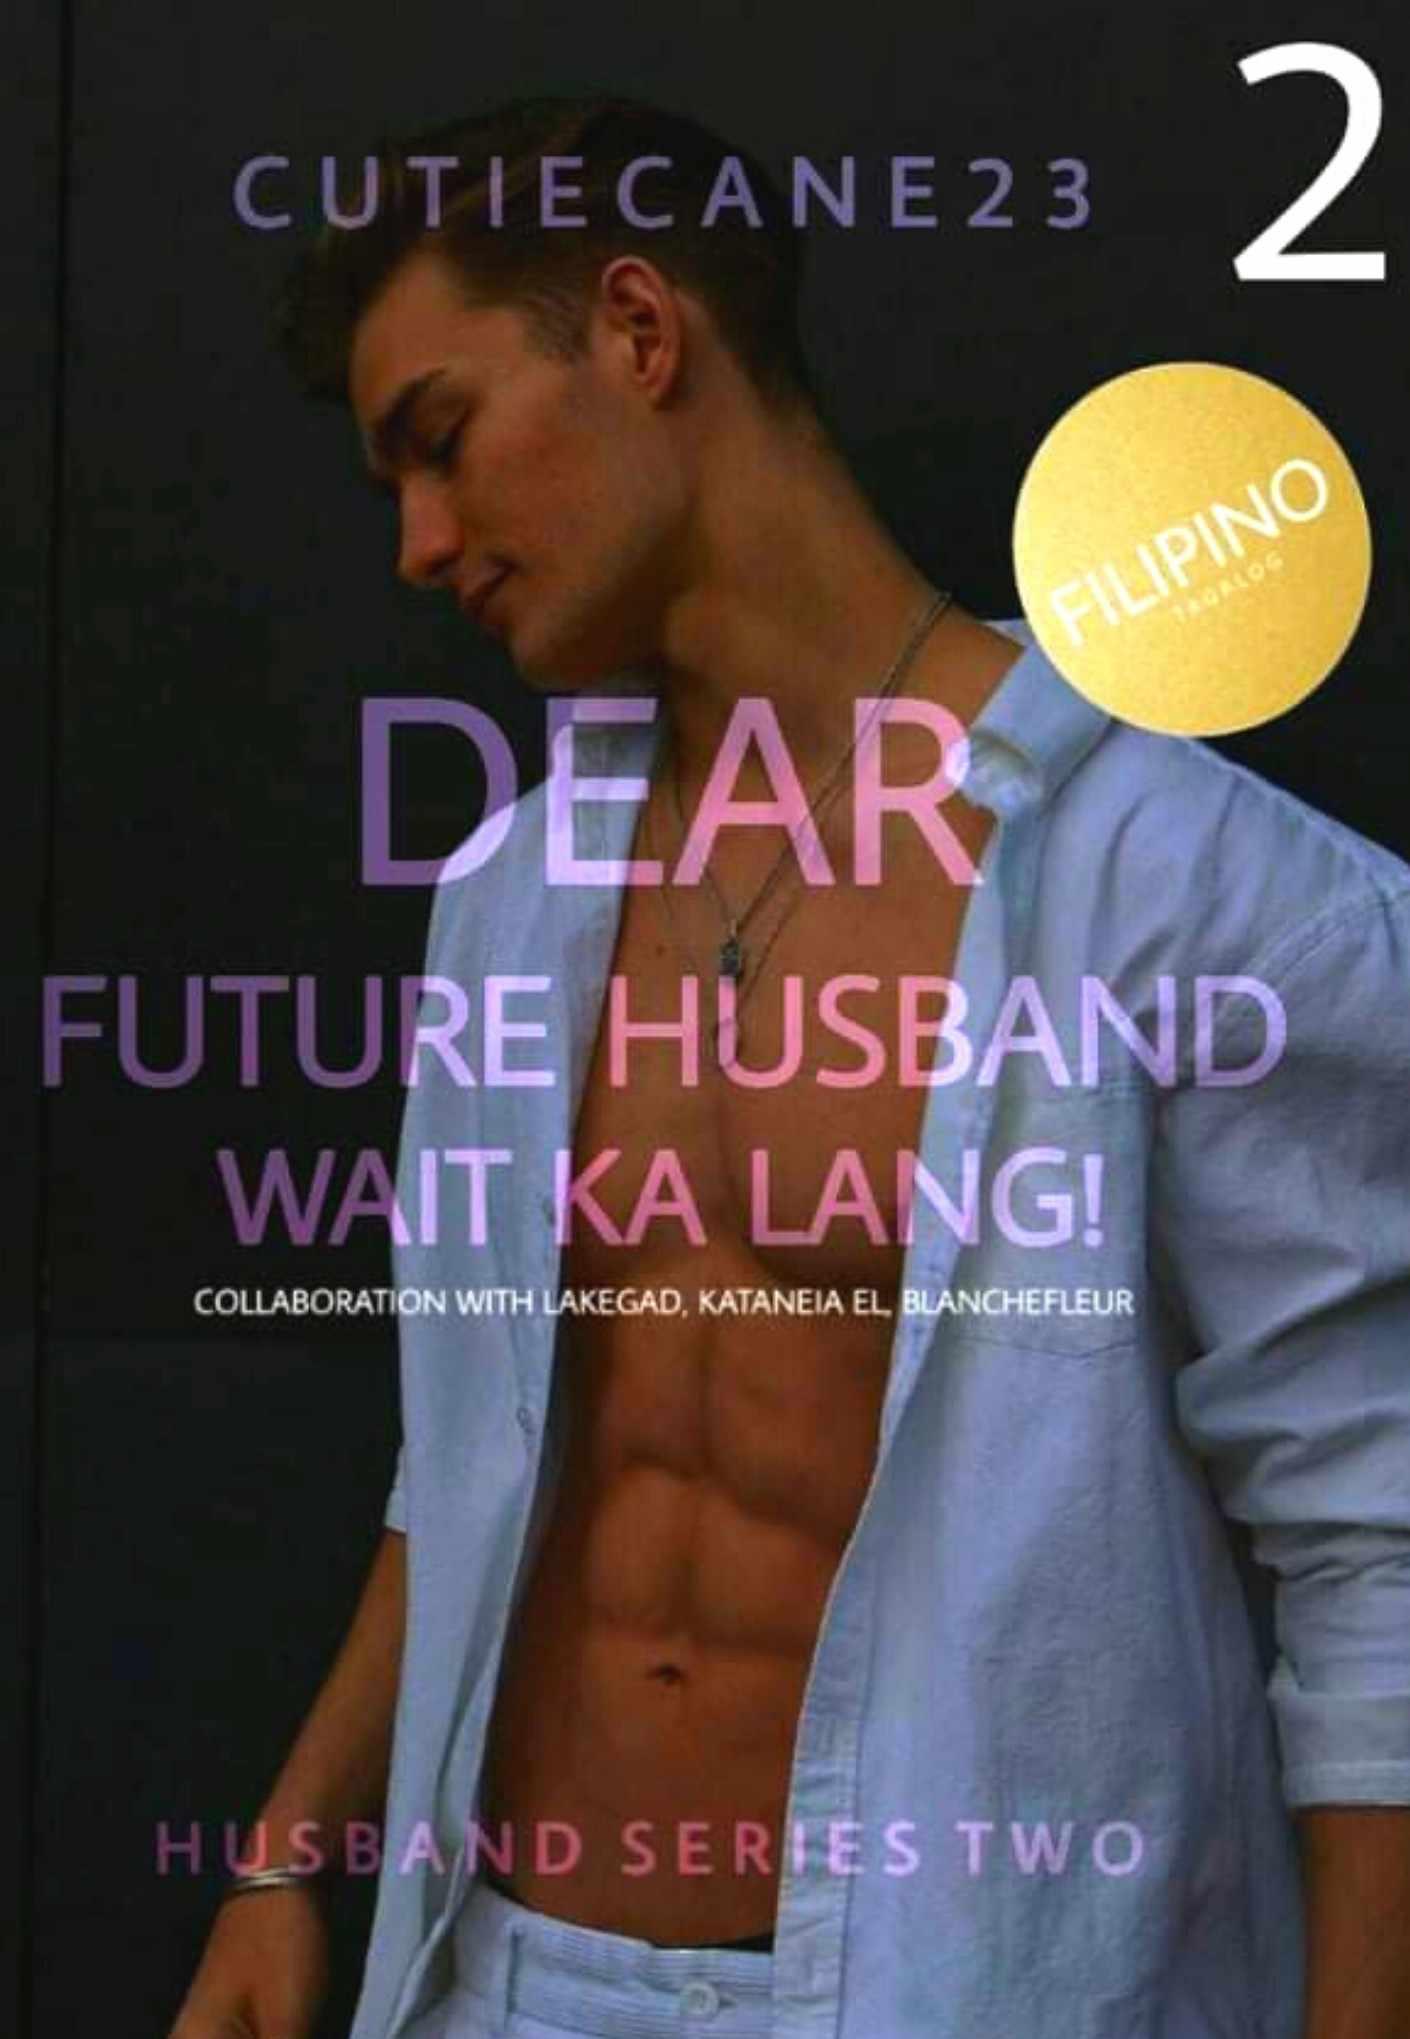 Husband Series 2: Dear Future Husband, Wait Ka Lang!